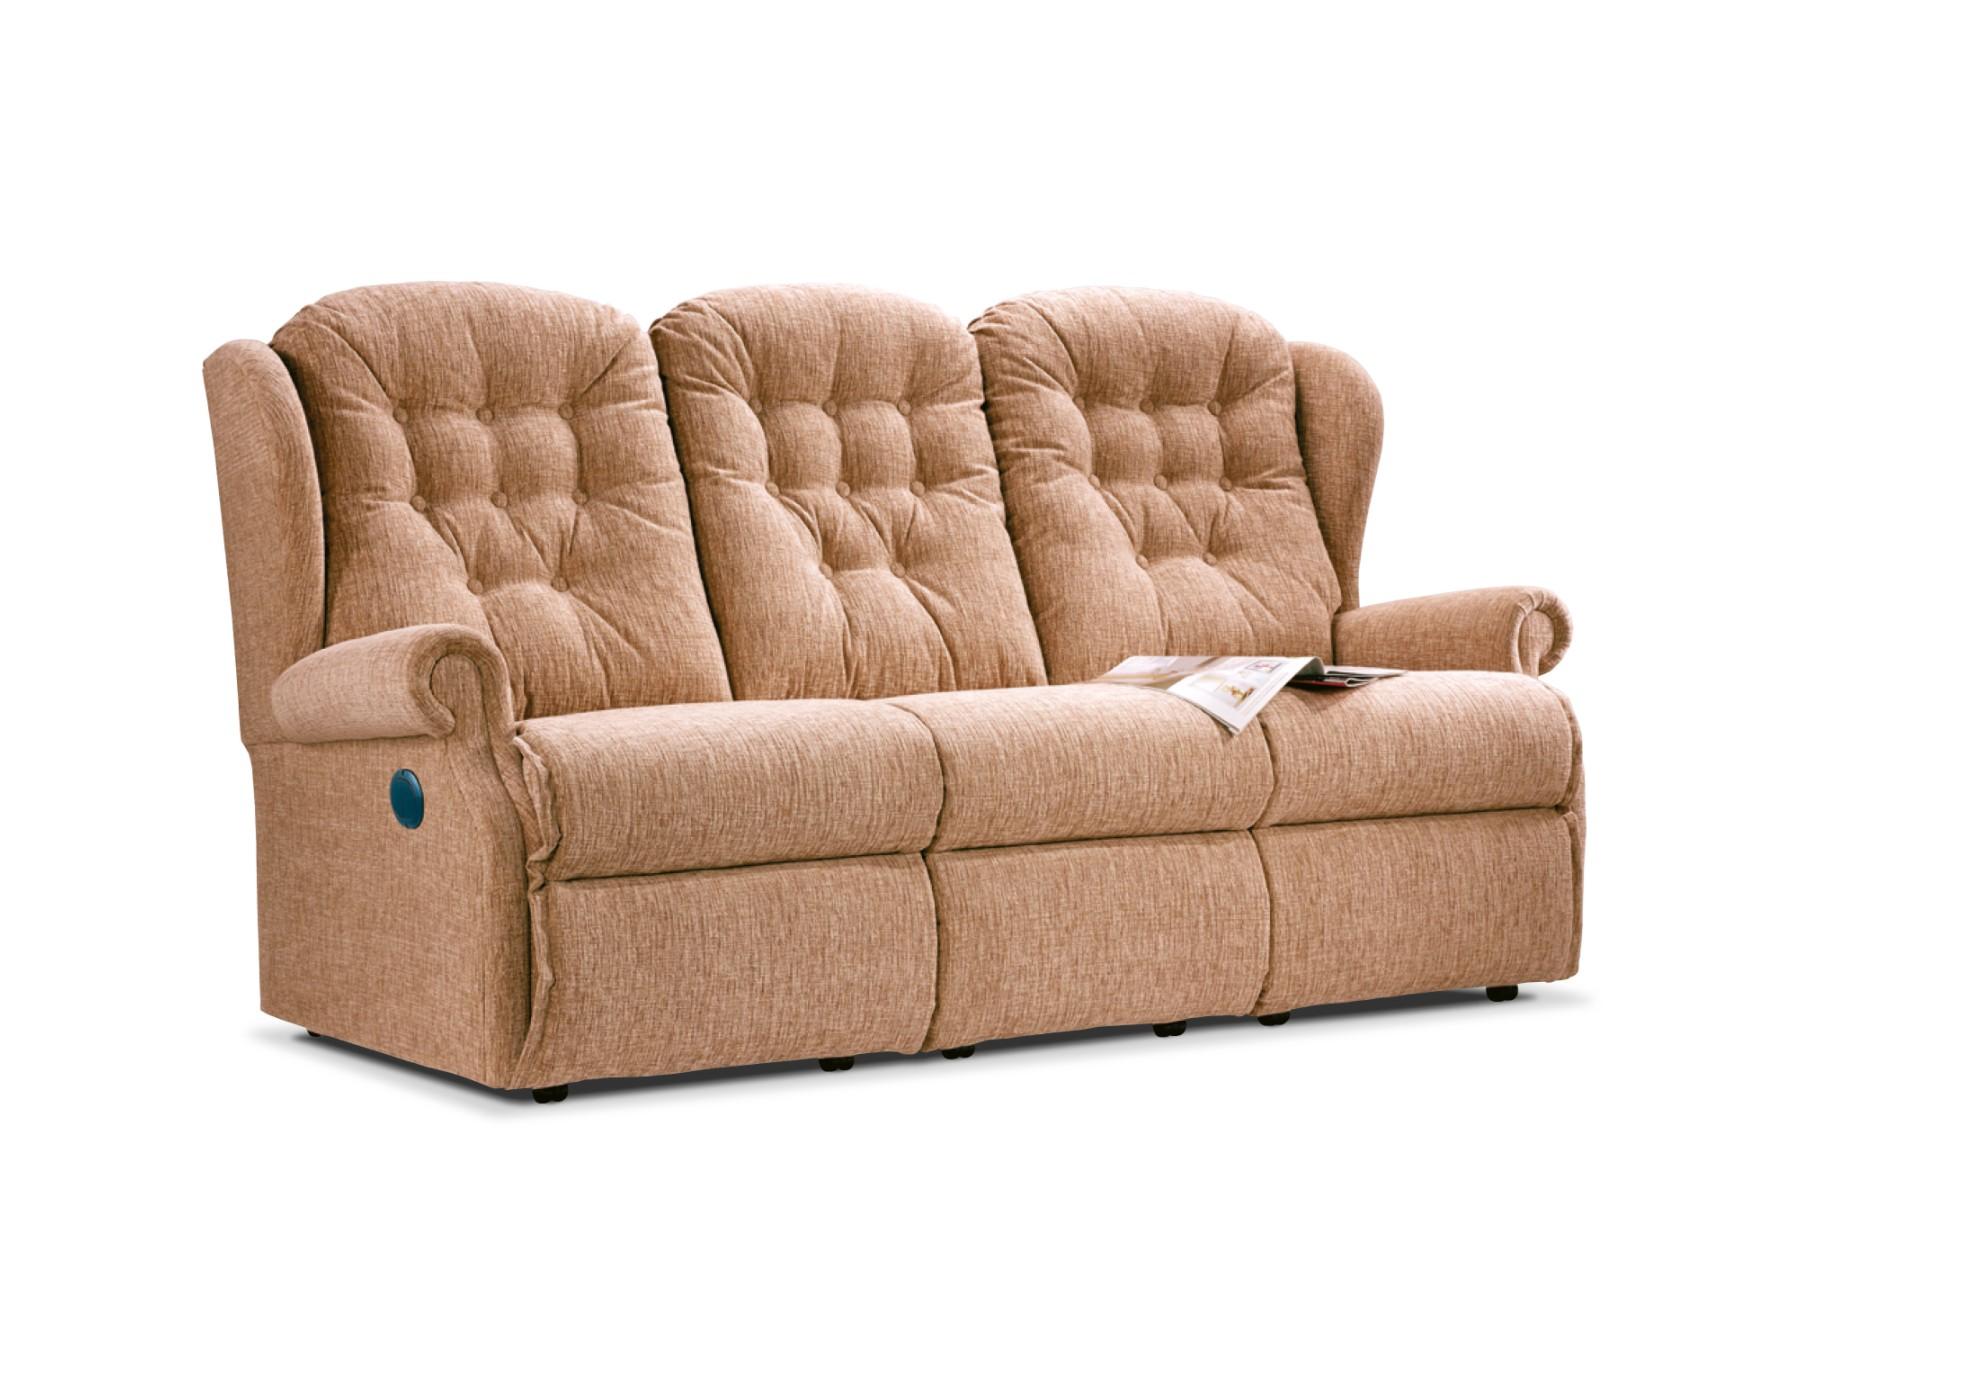 Lynton 3 Seater Sofa